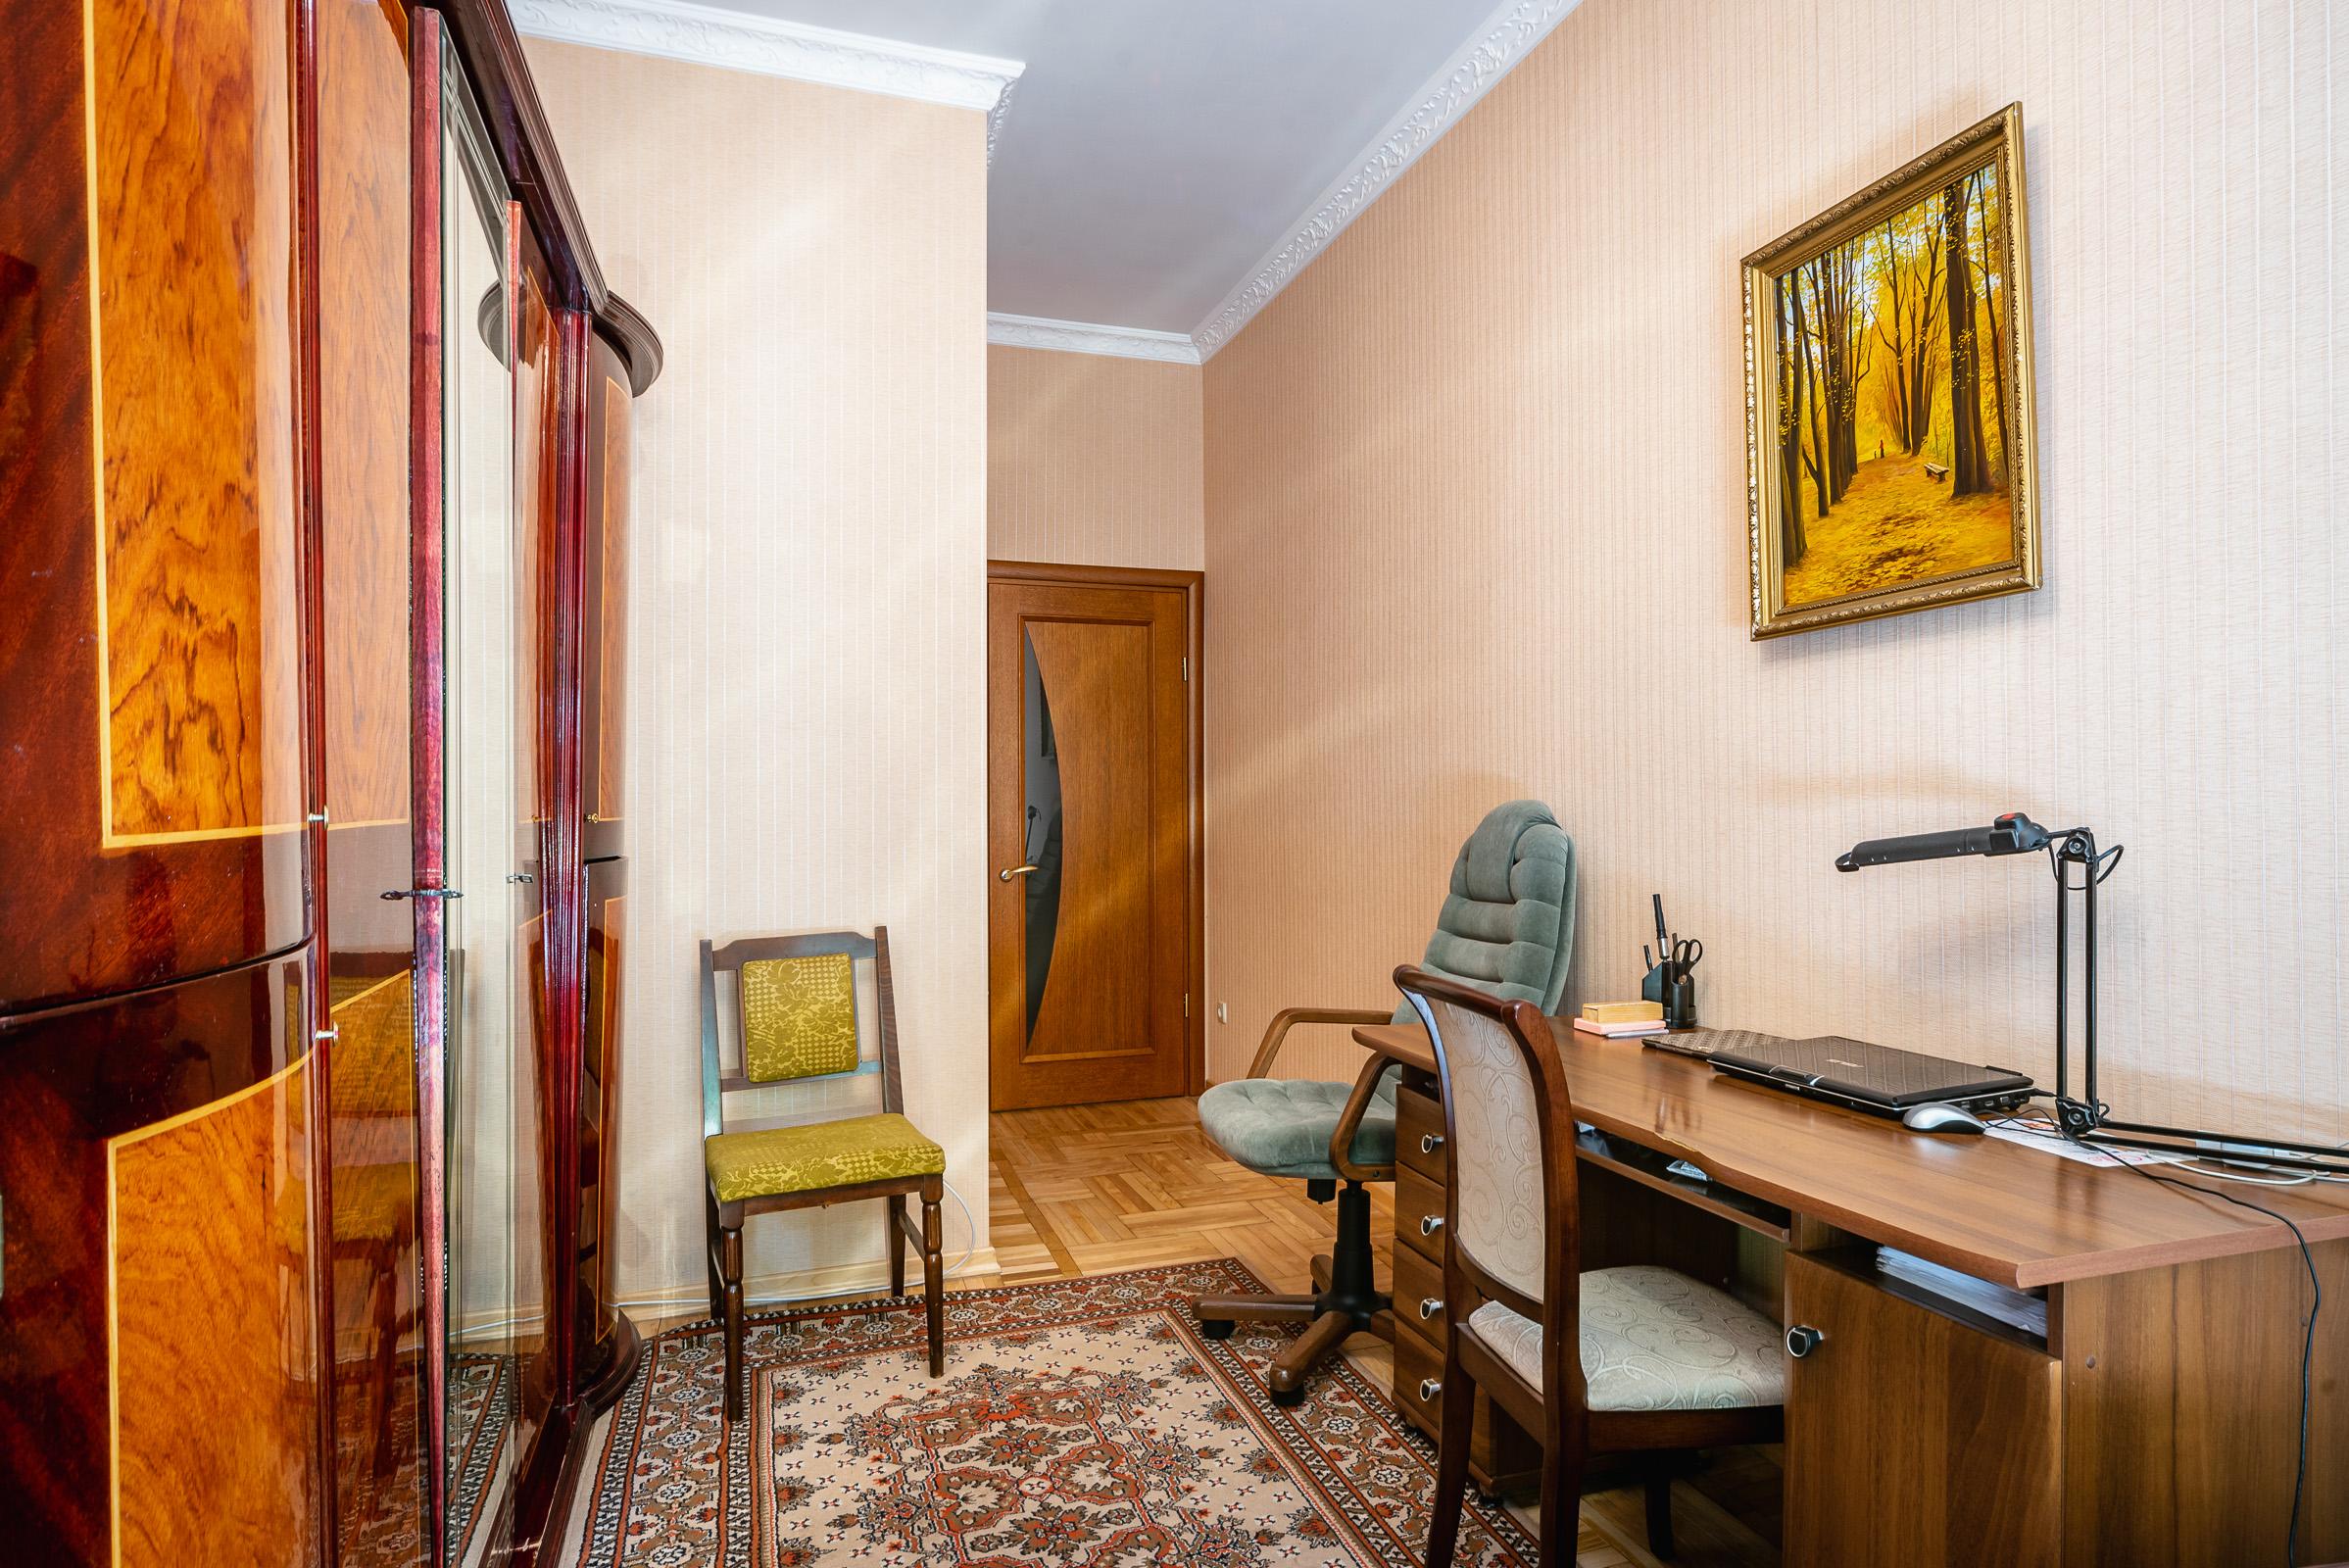 Квартира в историческом доме 17